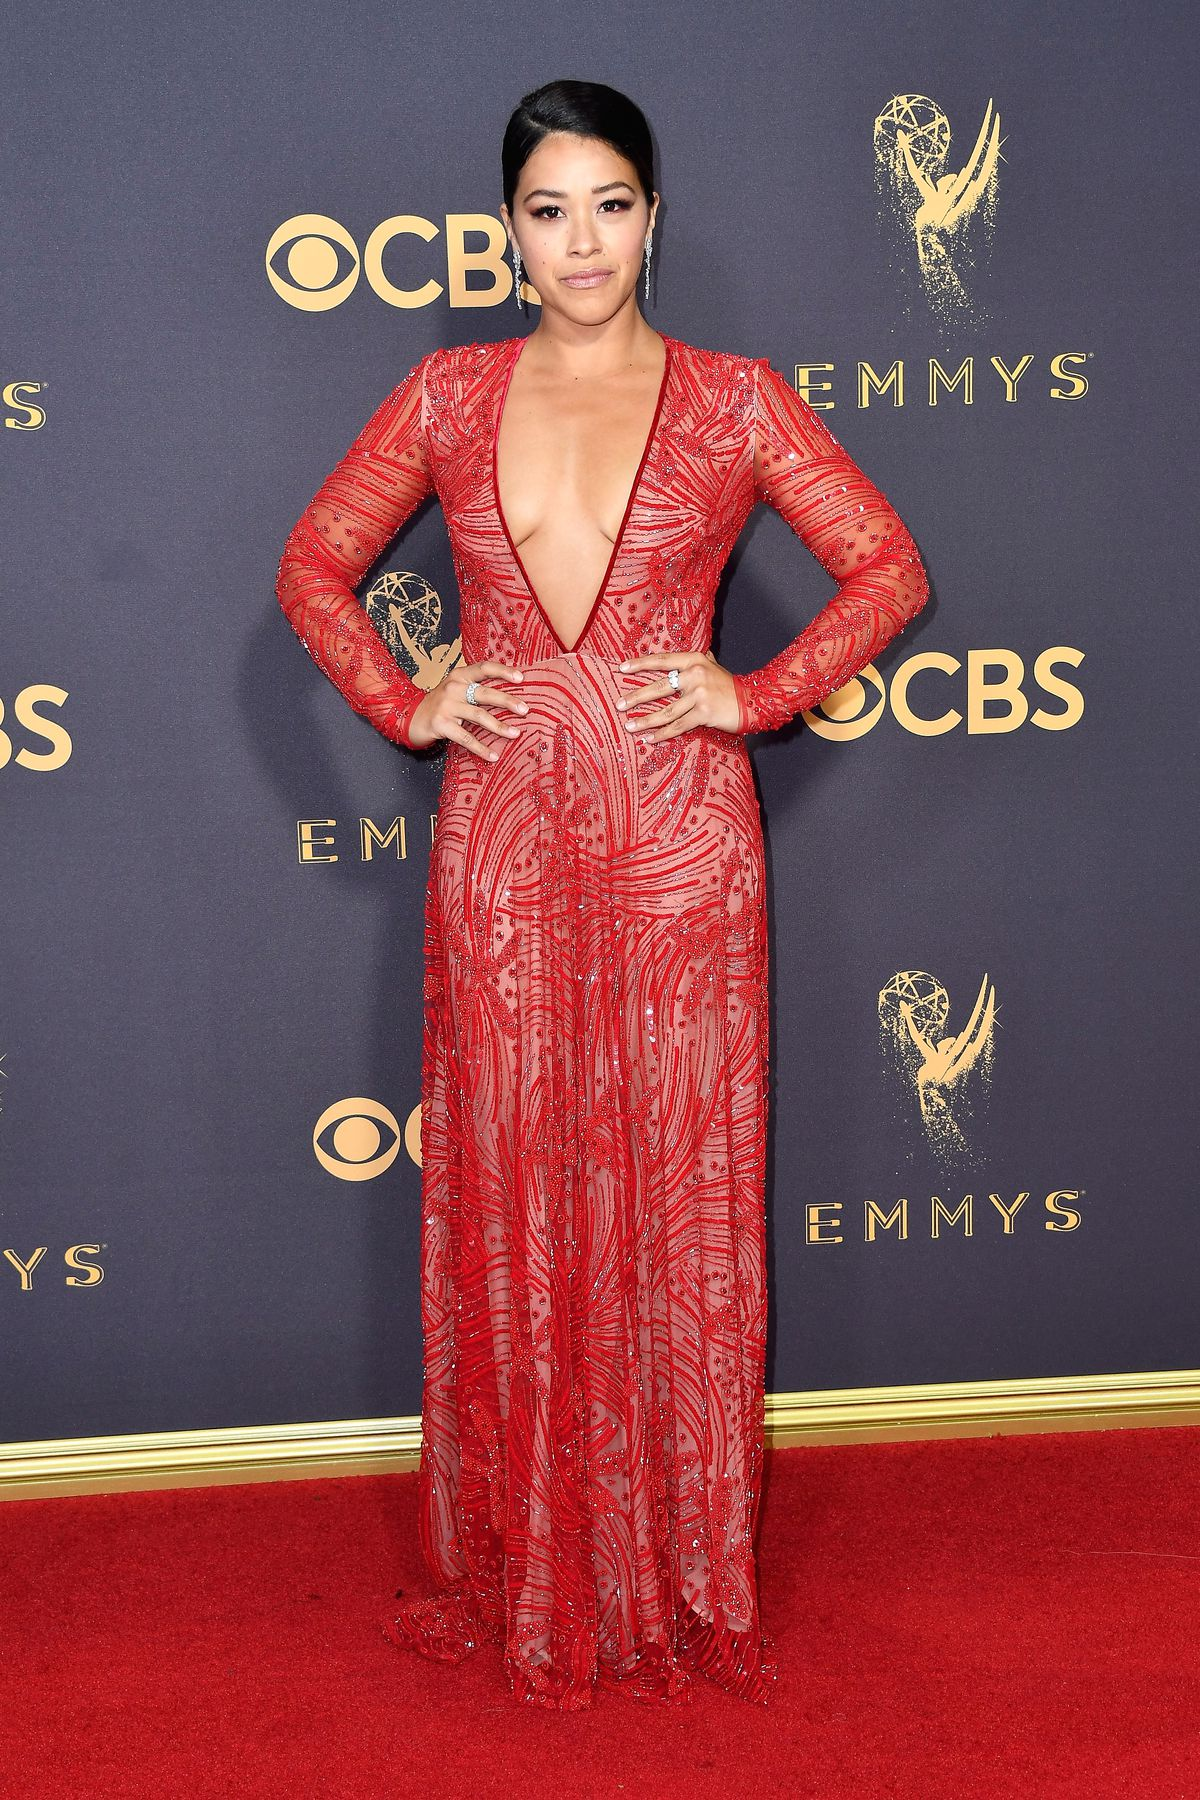 Gina Rodriguez at the 2017 Emmys.